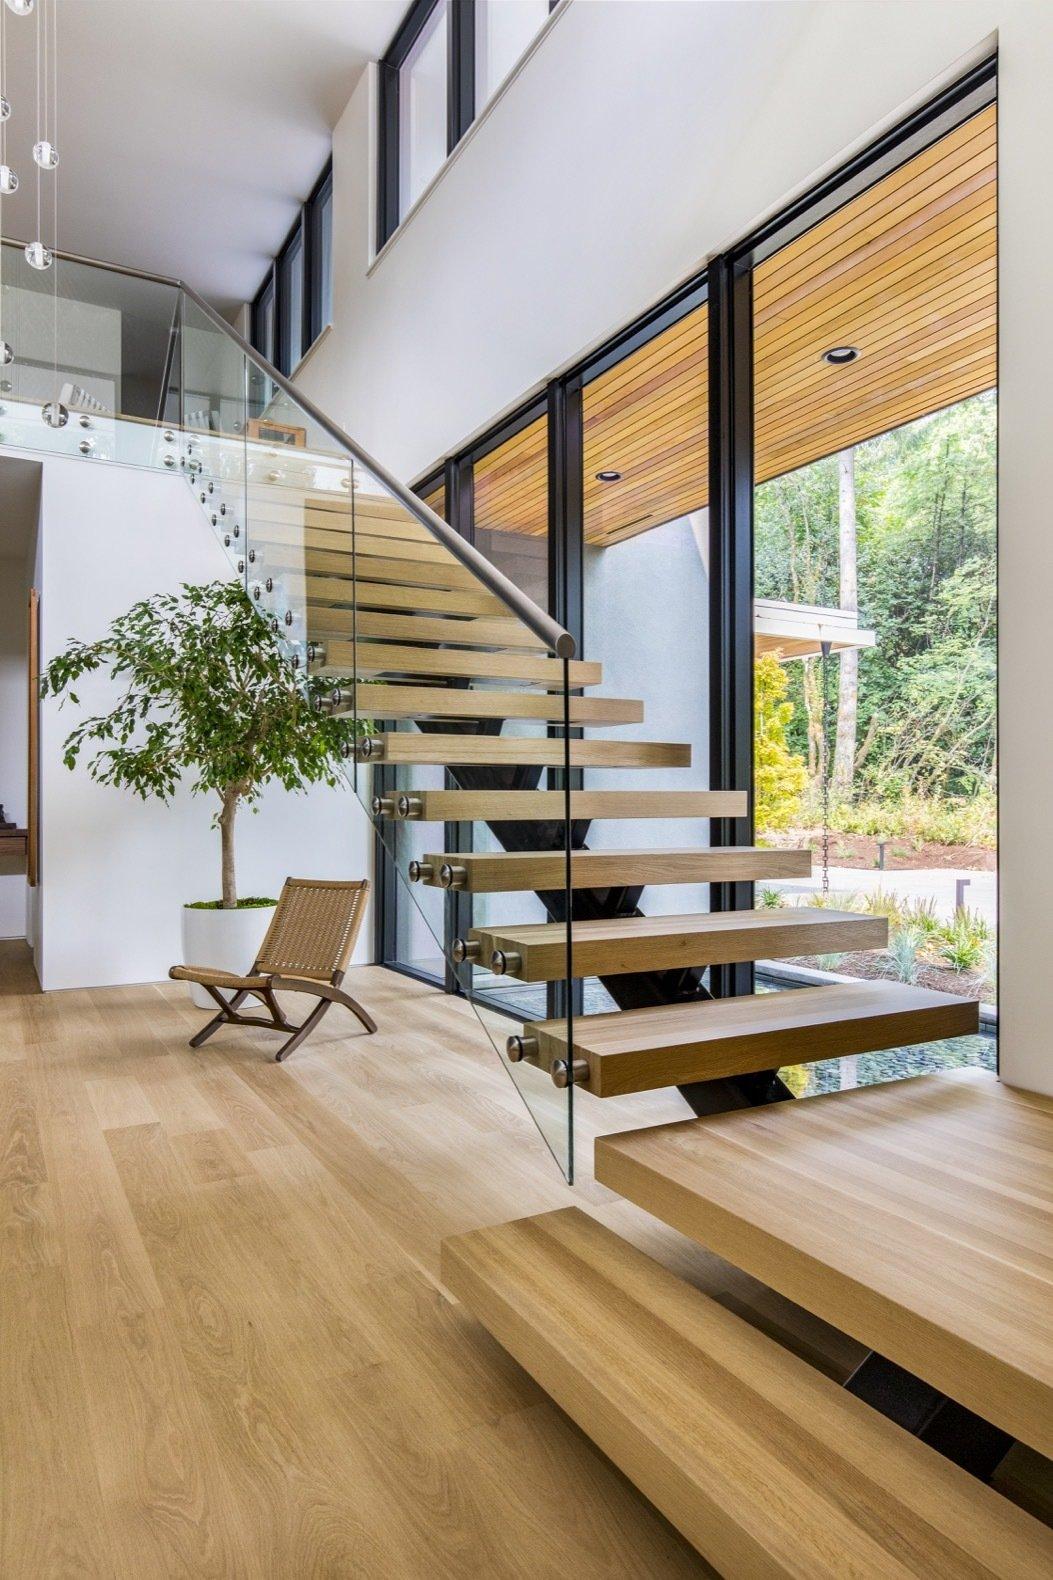 Wildwood House staircase